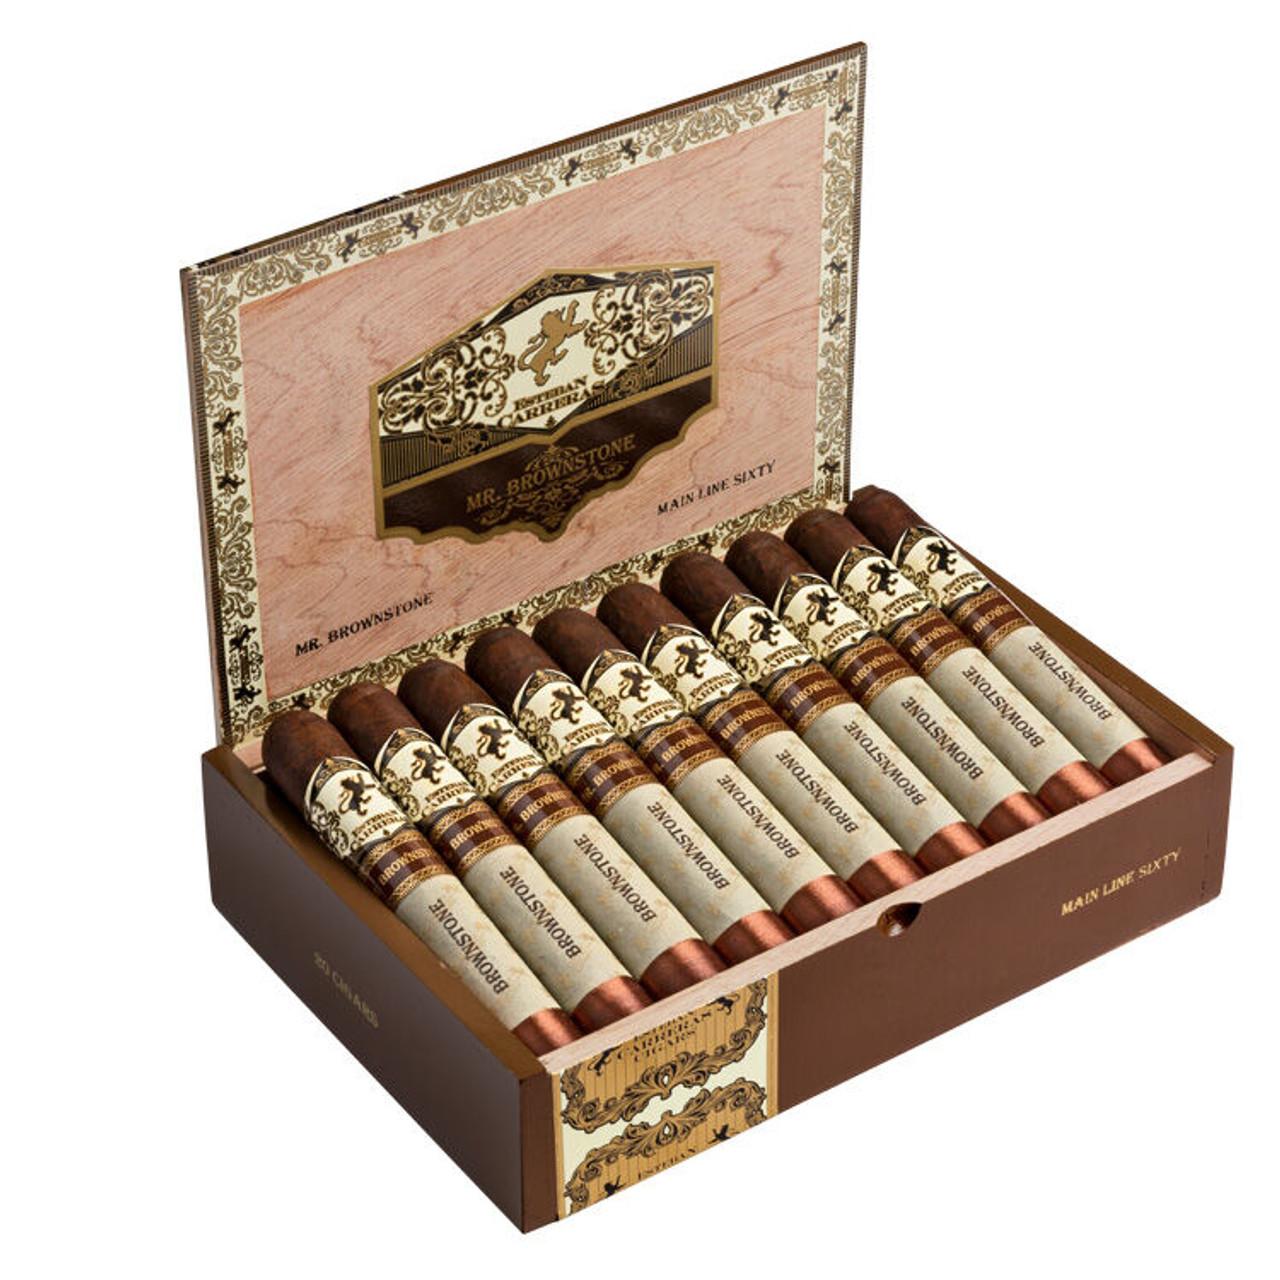 Esteban Carreras Mr. Brownstone Speedball Robusto Cigars - 5 x 54 (Box of 10)